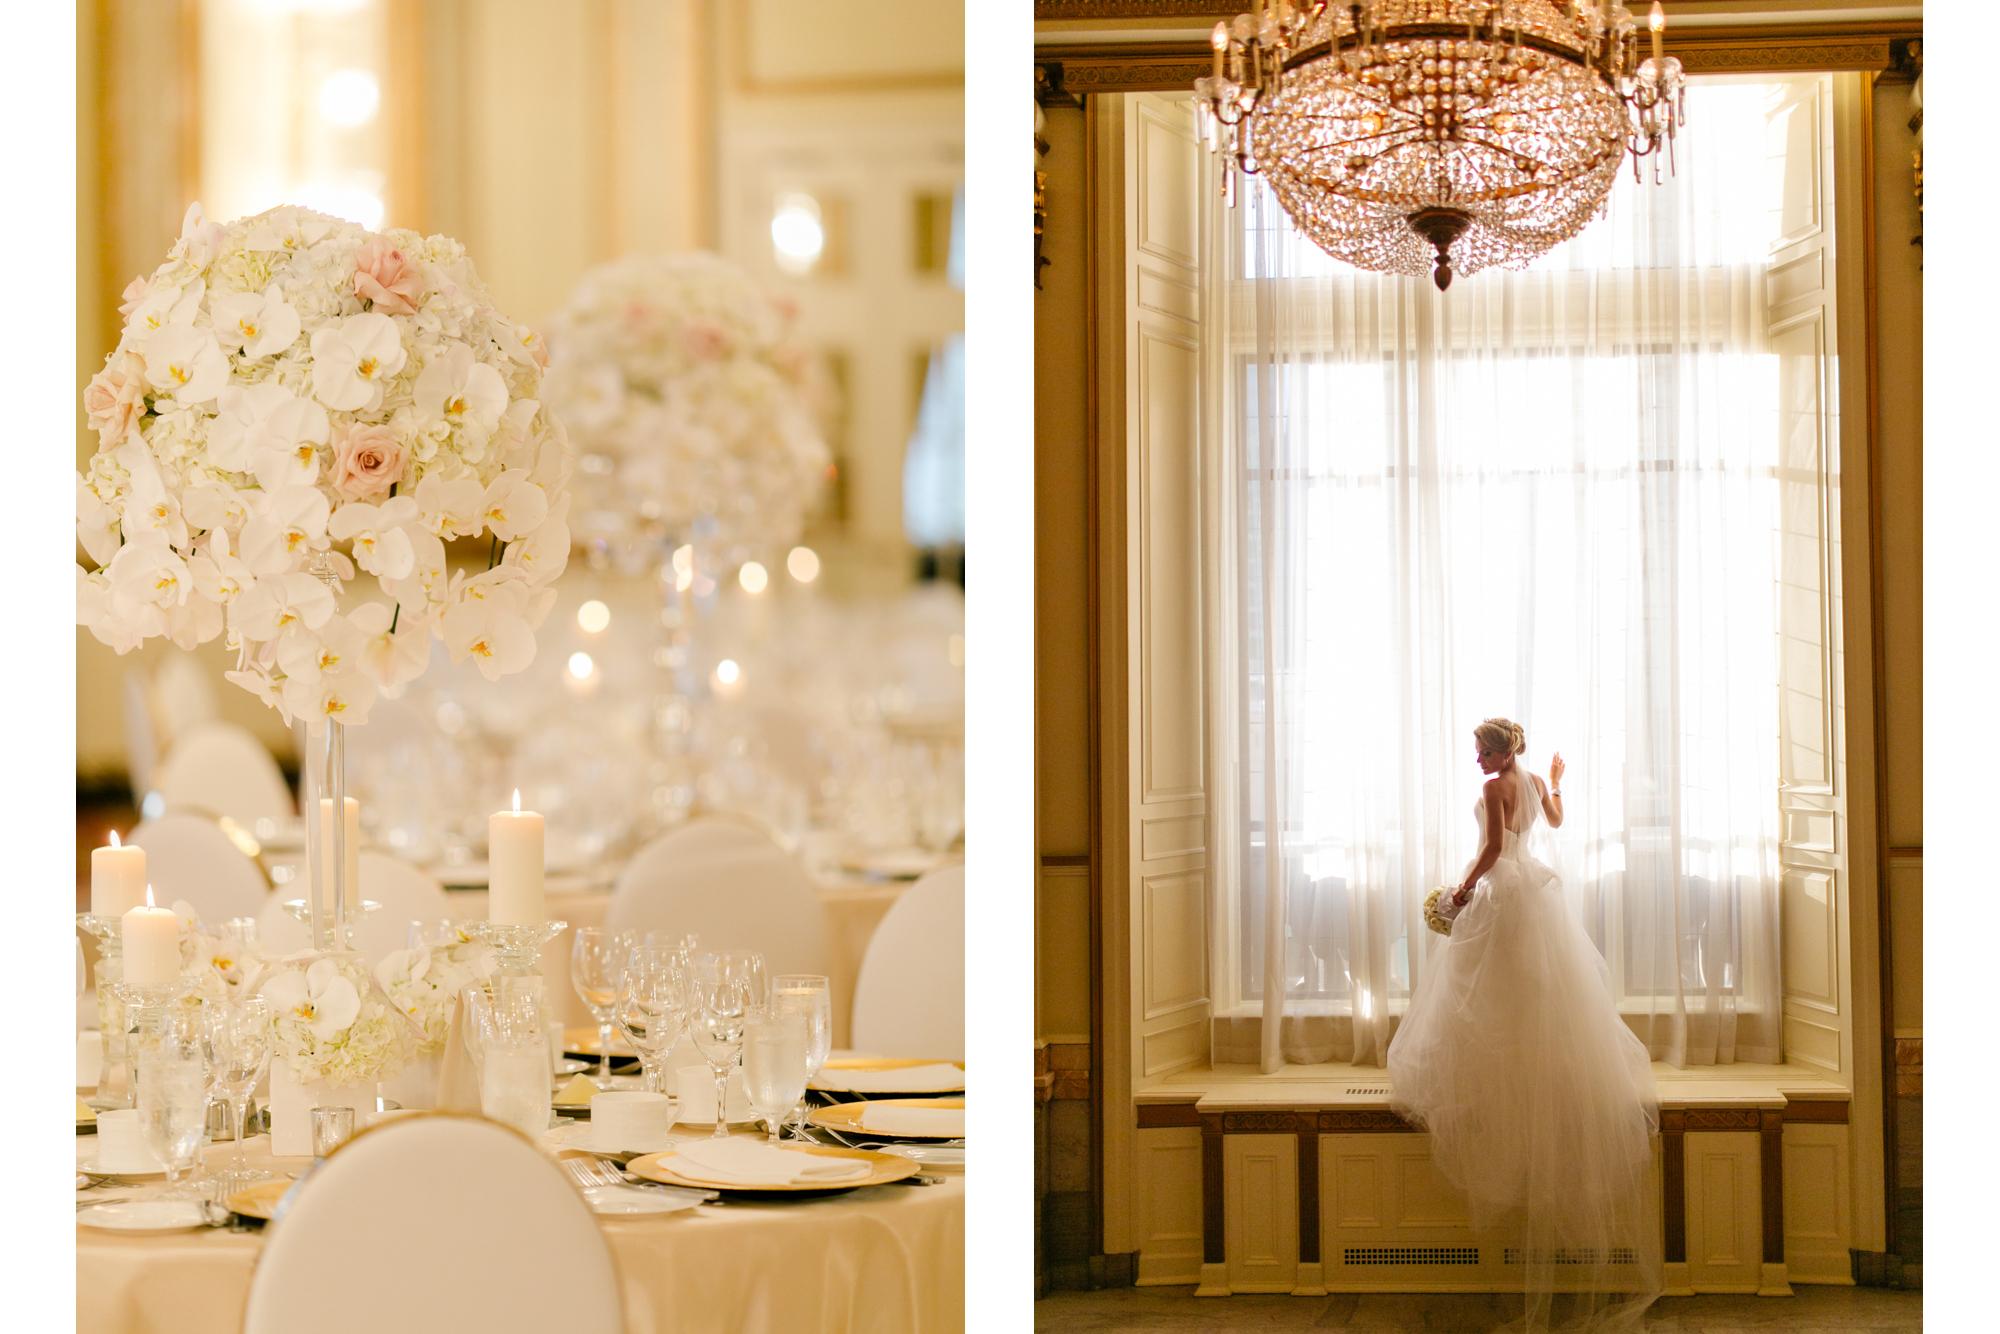 vancouver-luxury-wedding-photographer-lori-miles-30.jpg